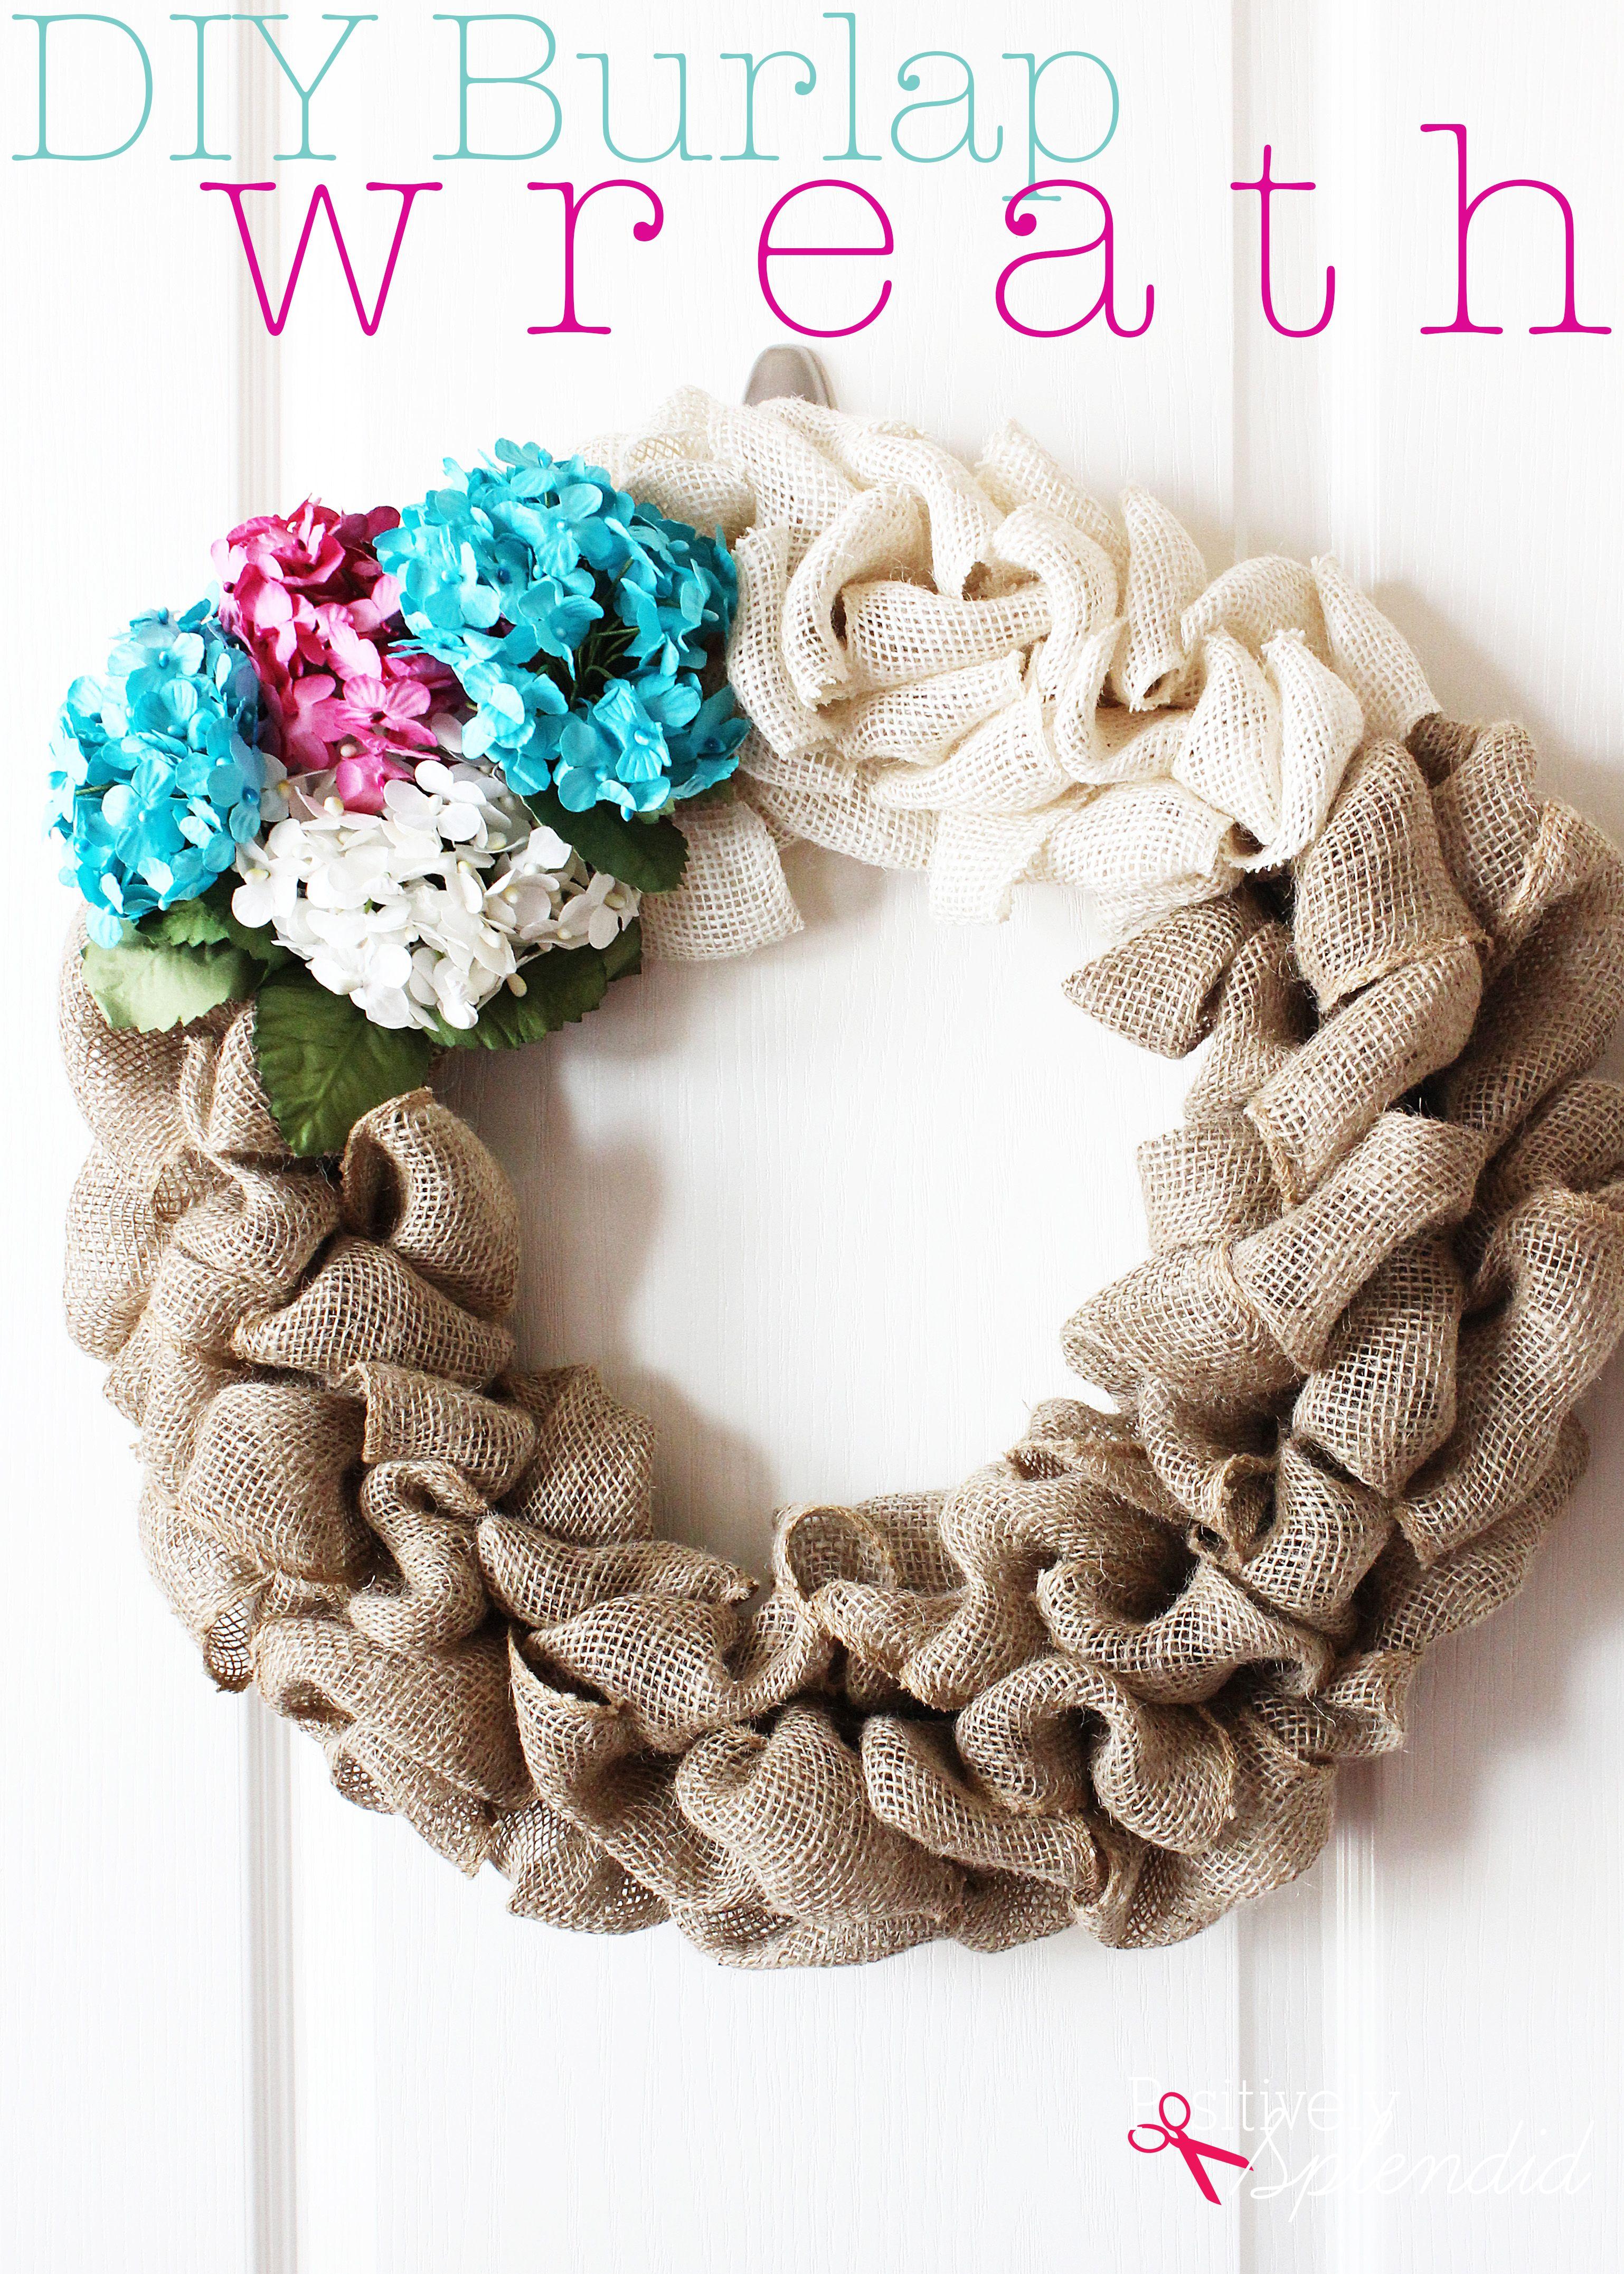 DIY Burlap Wreath Tutorial - So easy and fun to make! | Wire wreath ...